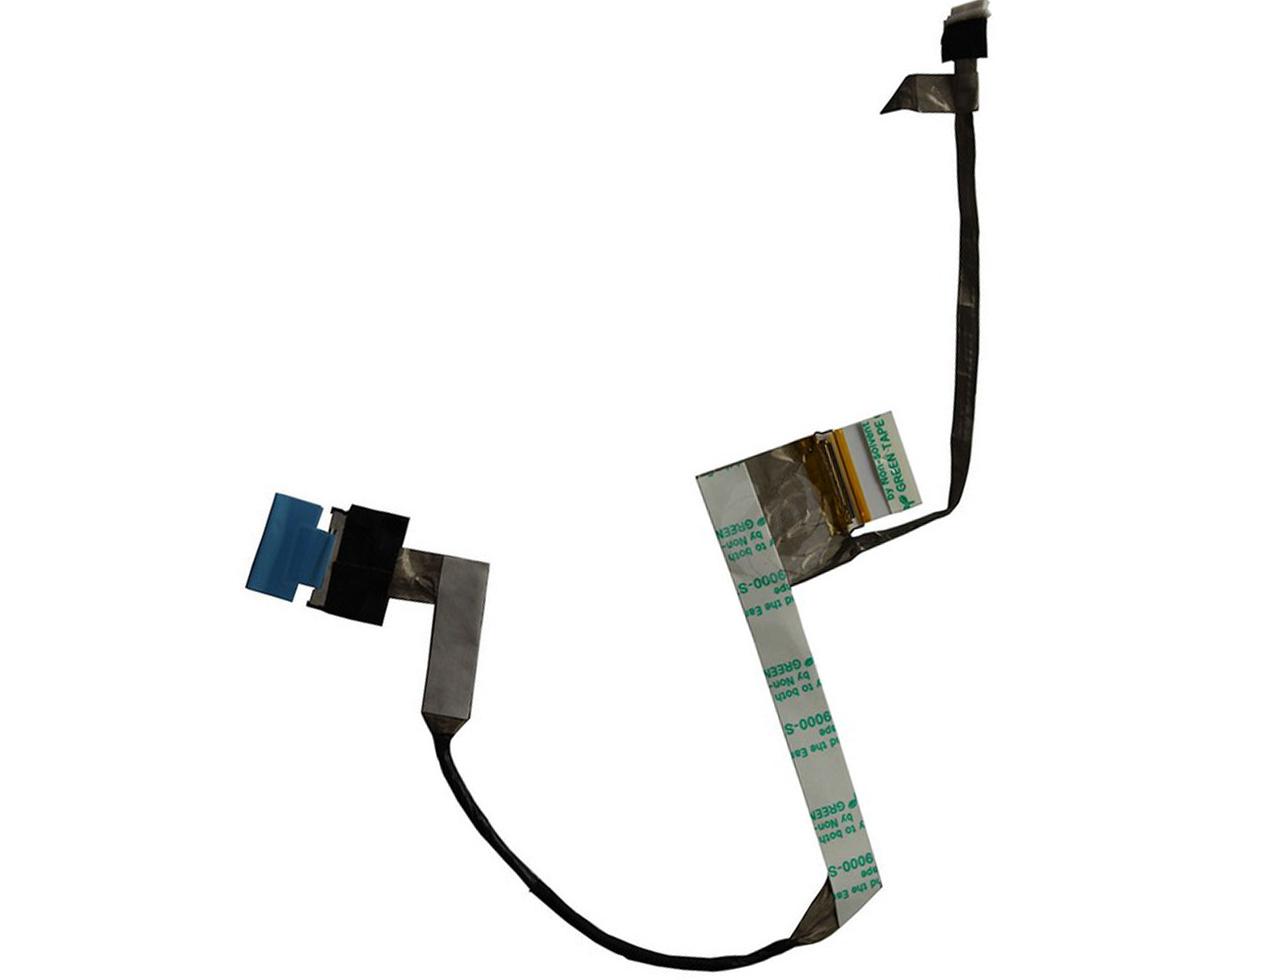 新到货72pcs  惠普HP ProBook 6360t 6360b LCD Display Screen Video Cable 50.4KT02.101 屏线 排线